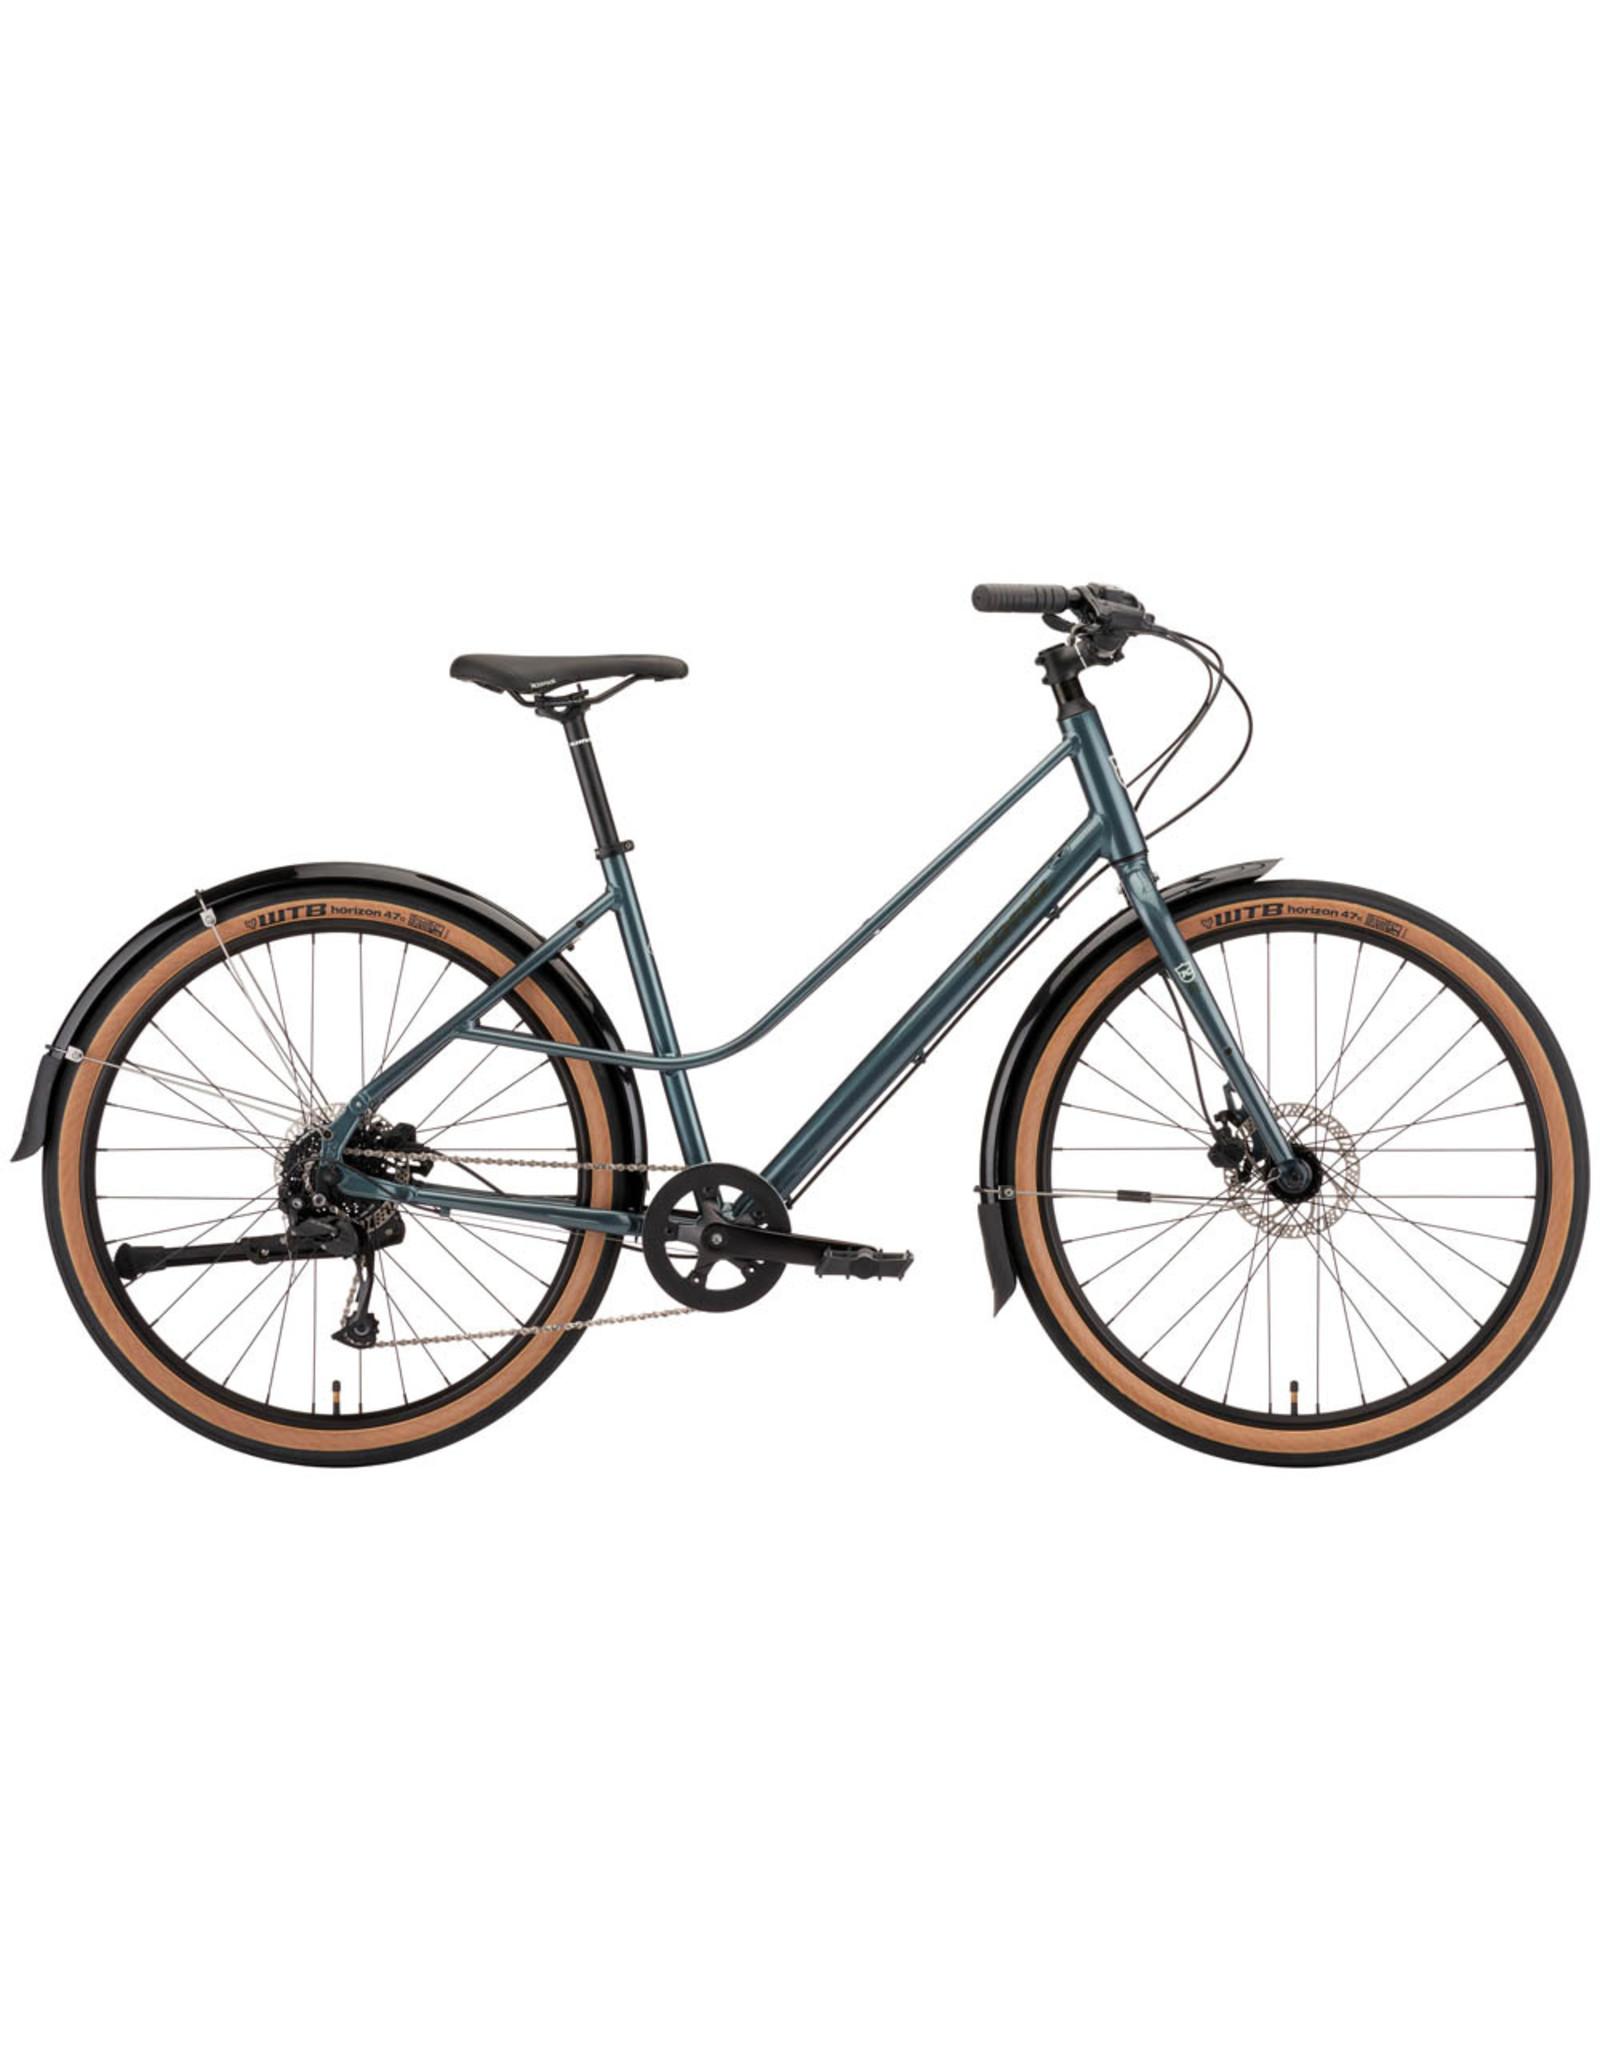 KONA Kona Bike Coco 2022